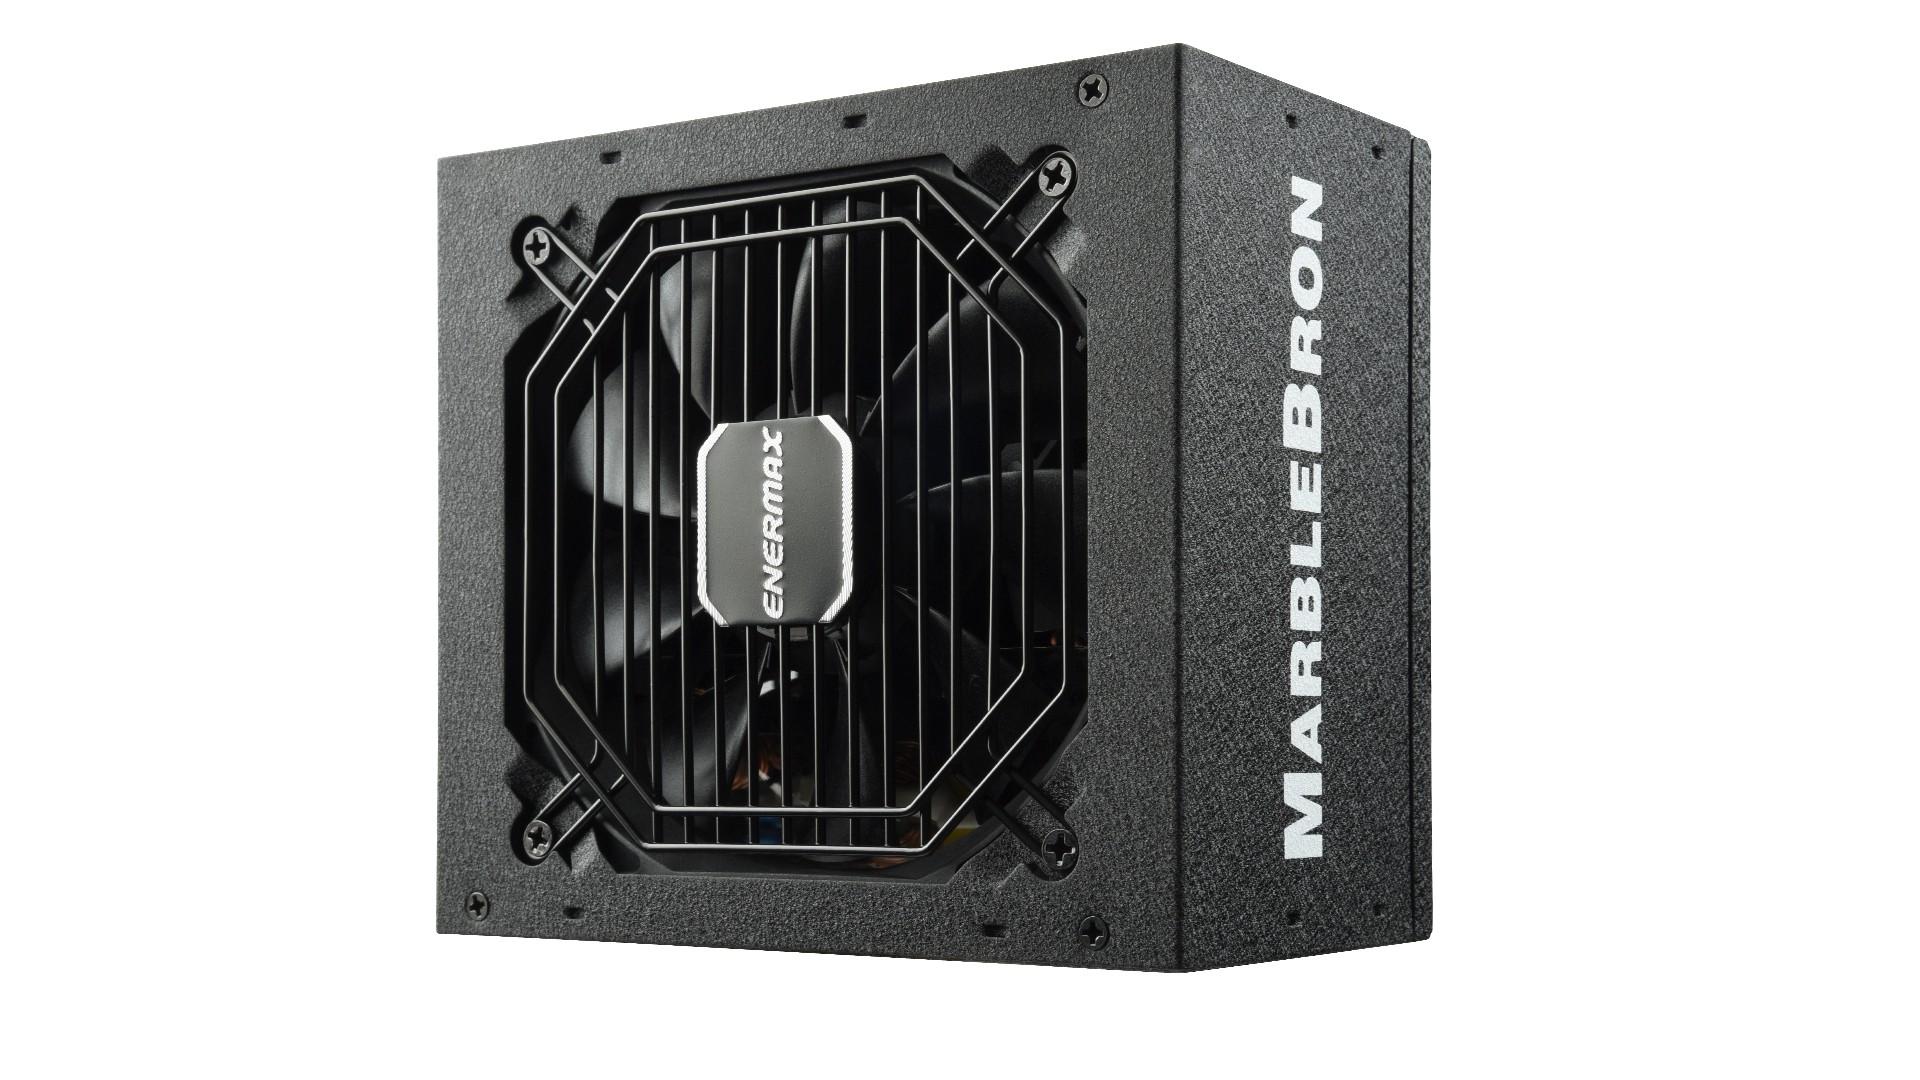 Enermax MarbleBron power supply unit 750 W 24-pin ATX ATX Zwart